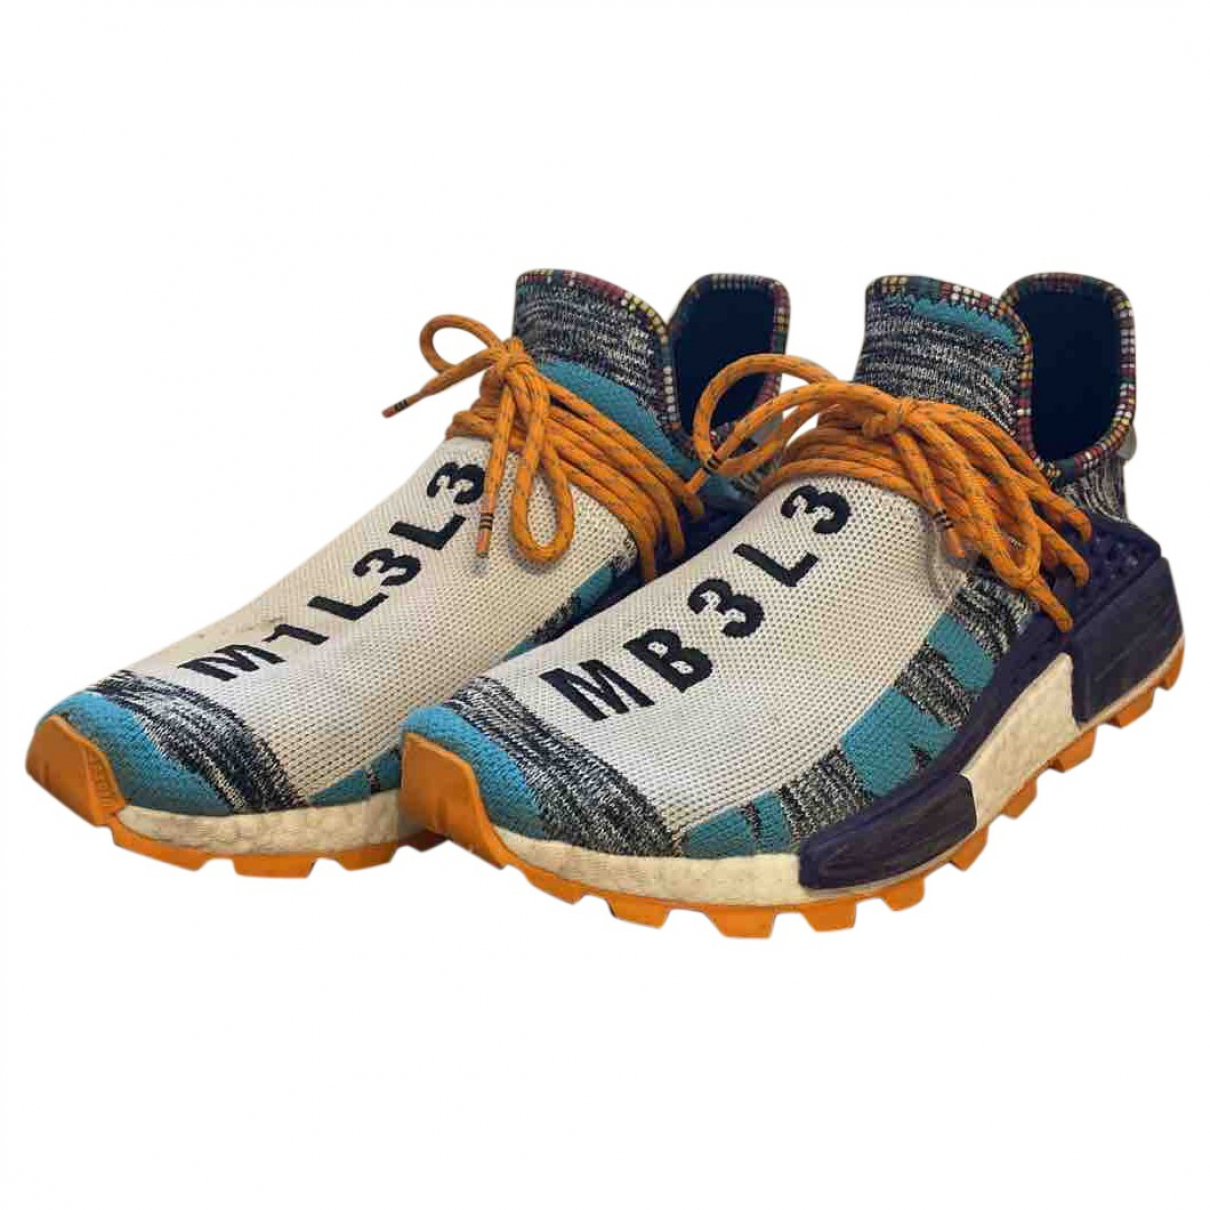 Adidas X Pharrell Williams NMD Hu Multicolour Cloth Trainers for Men 44 EU